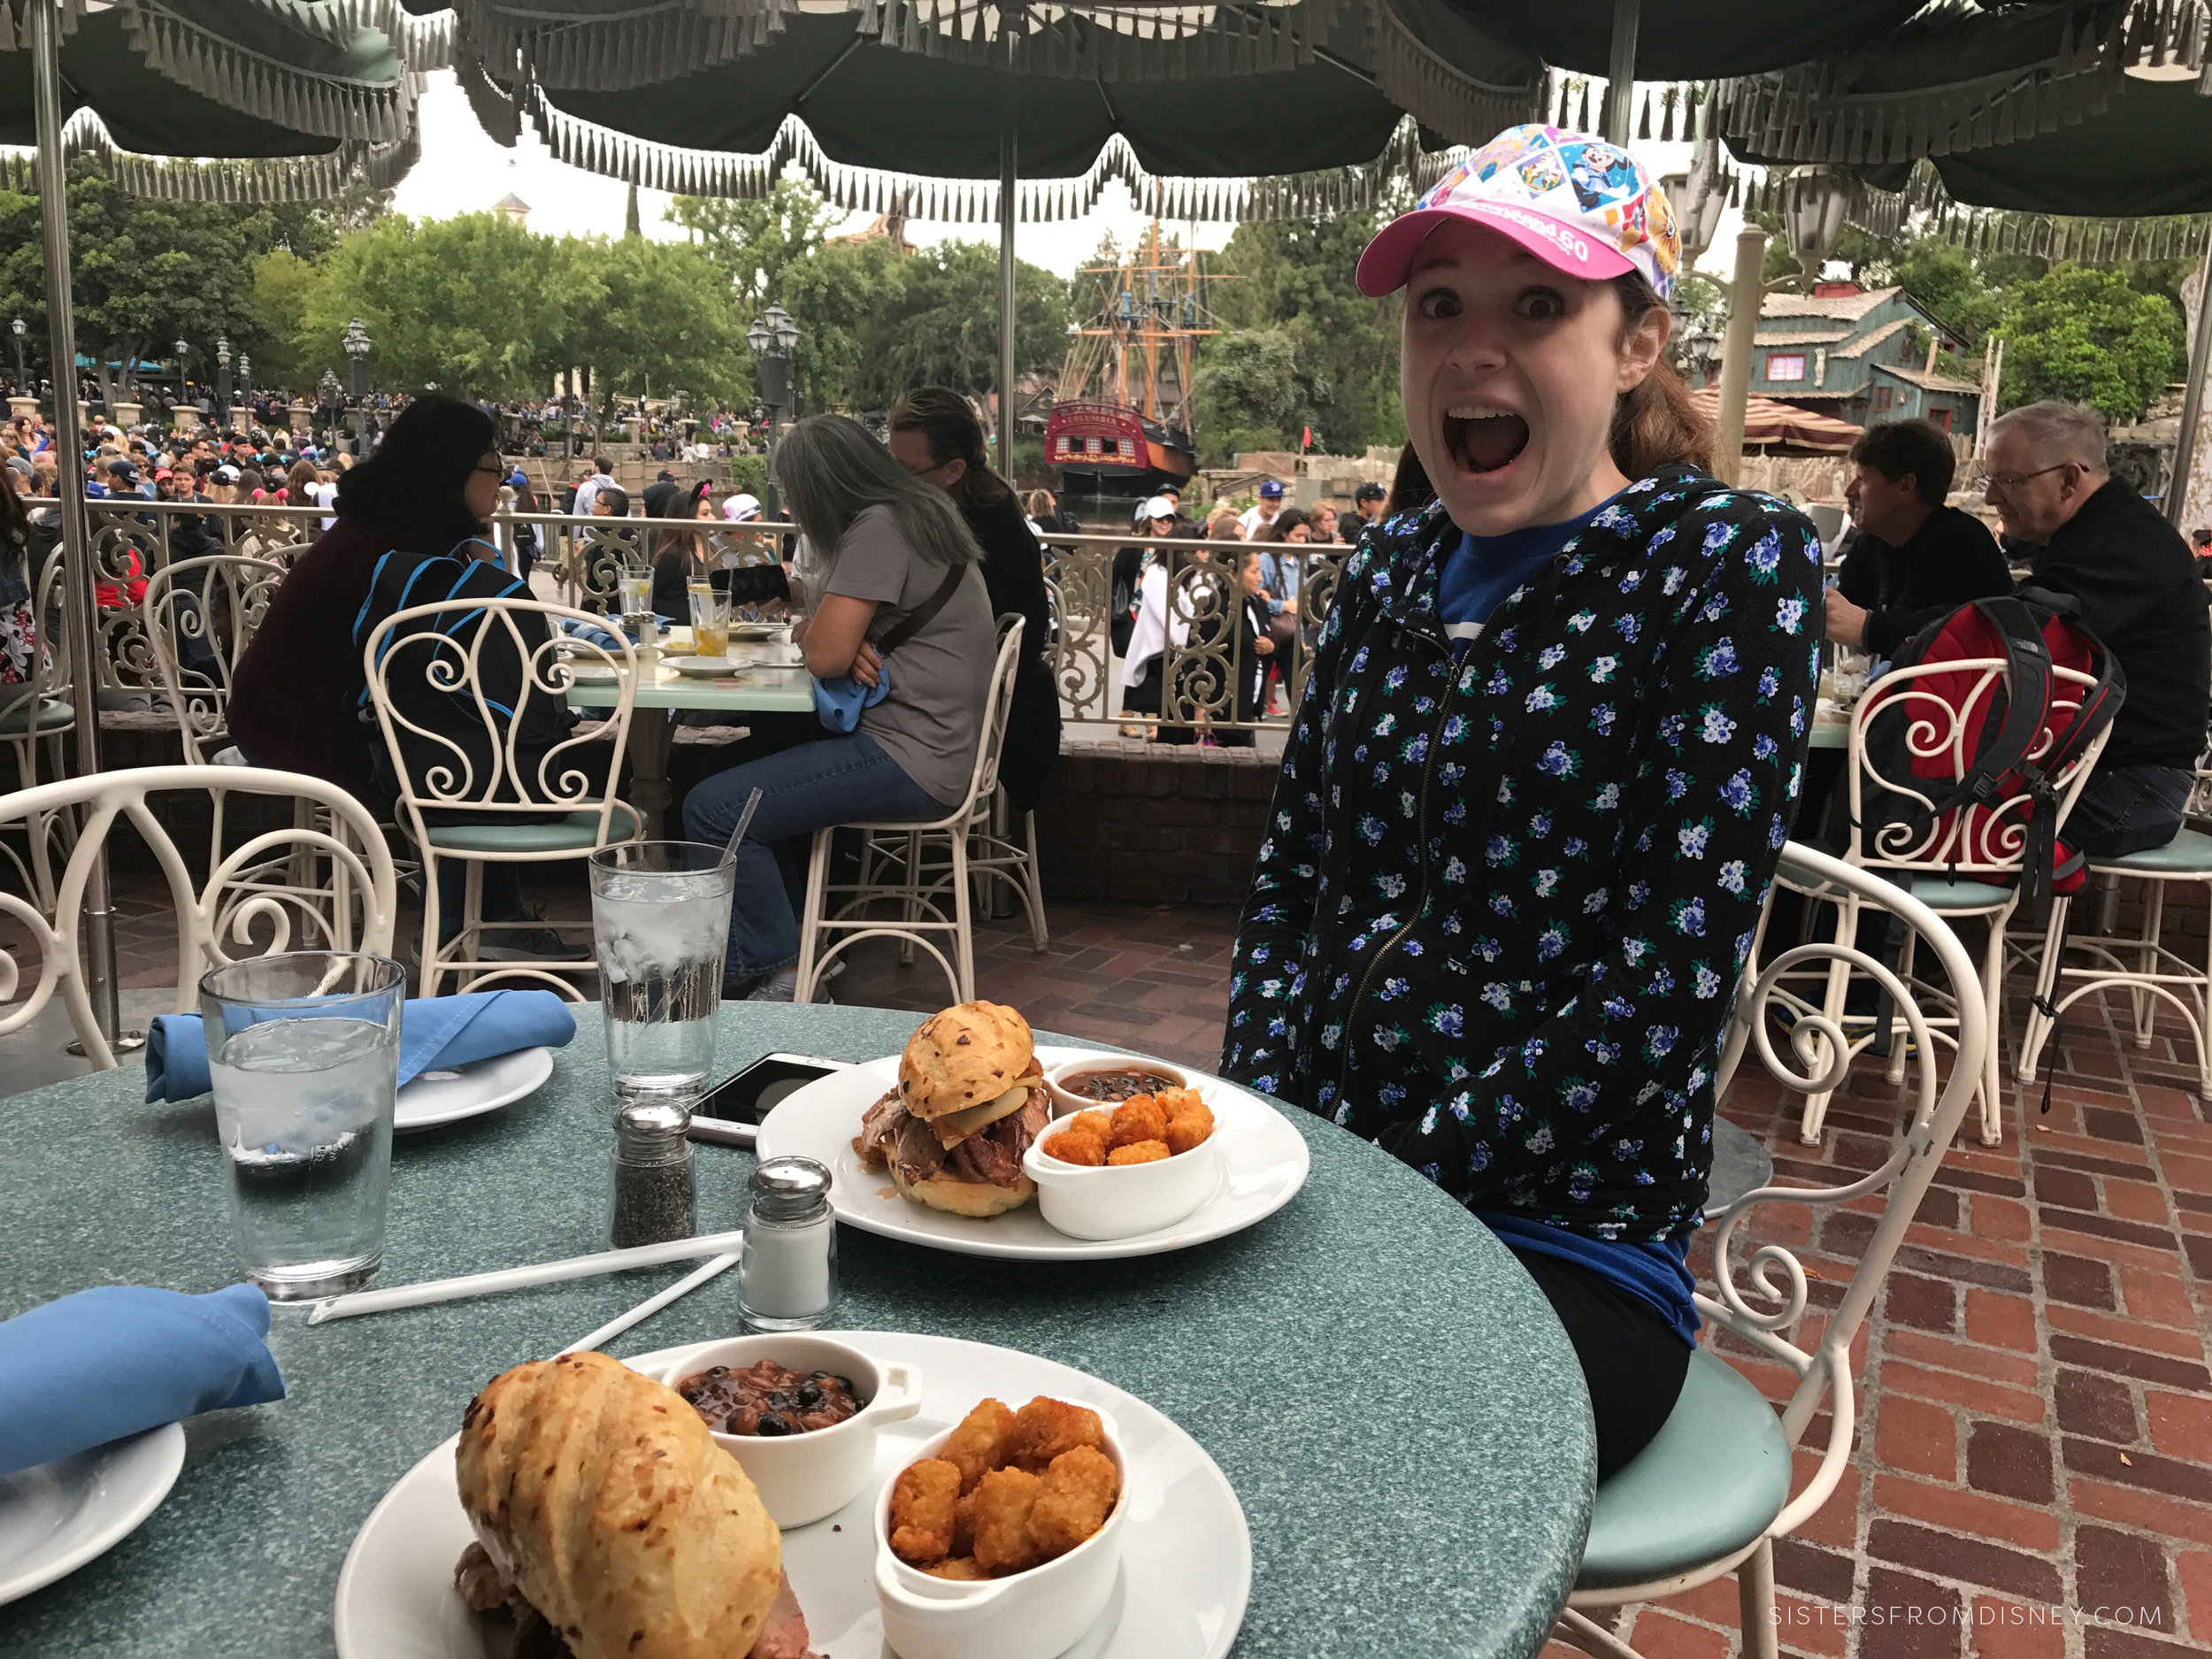 2018June_SFDblog_DisneylandWOKids-1176.jpg